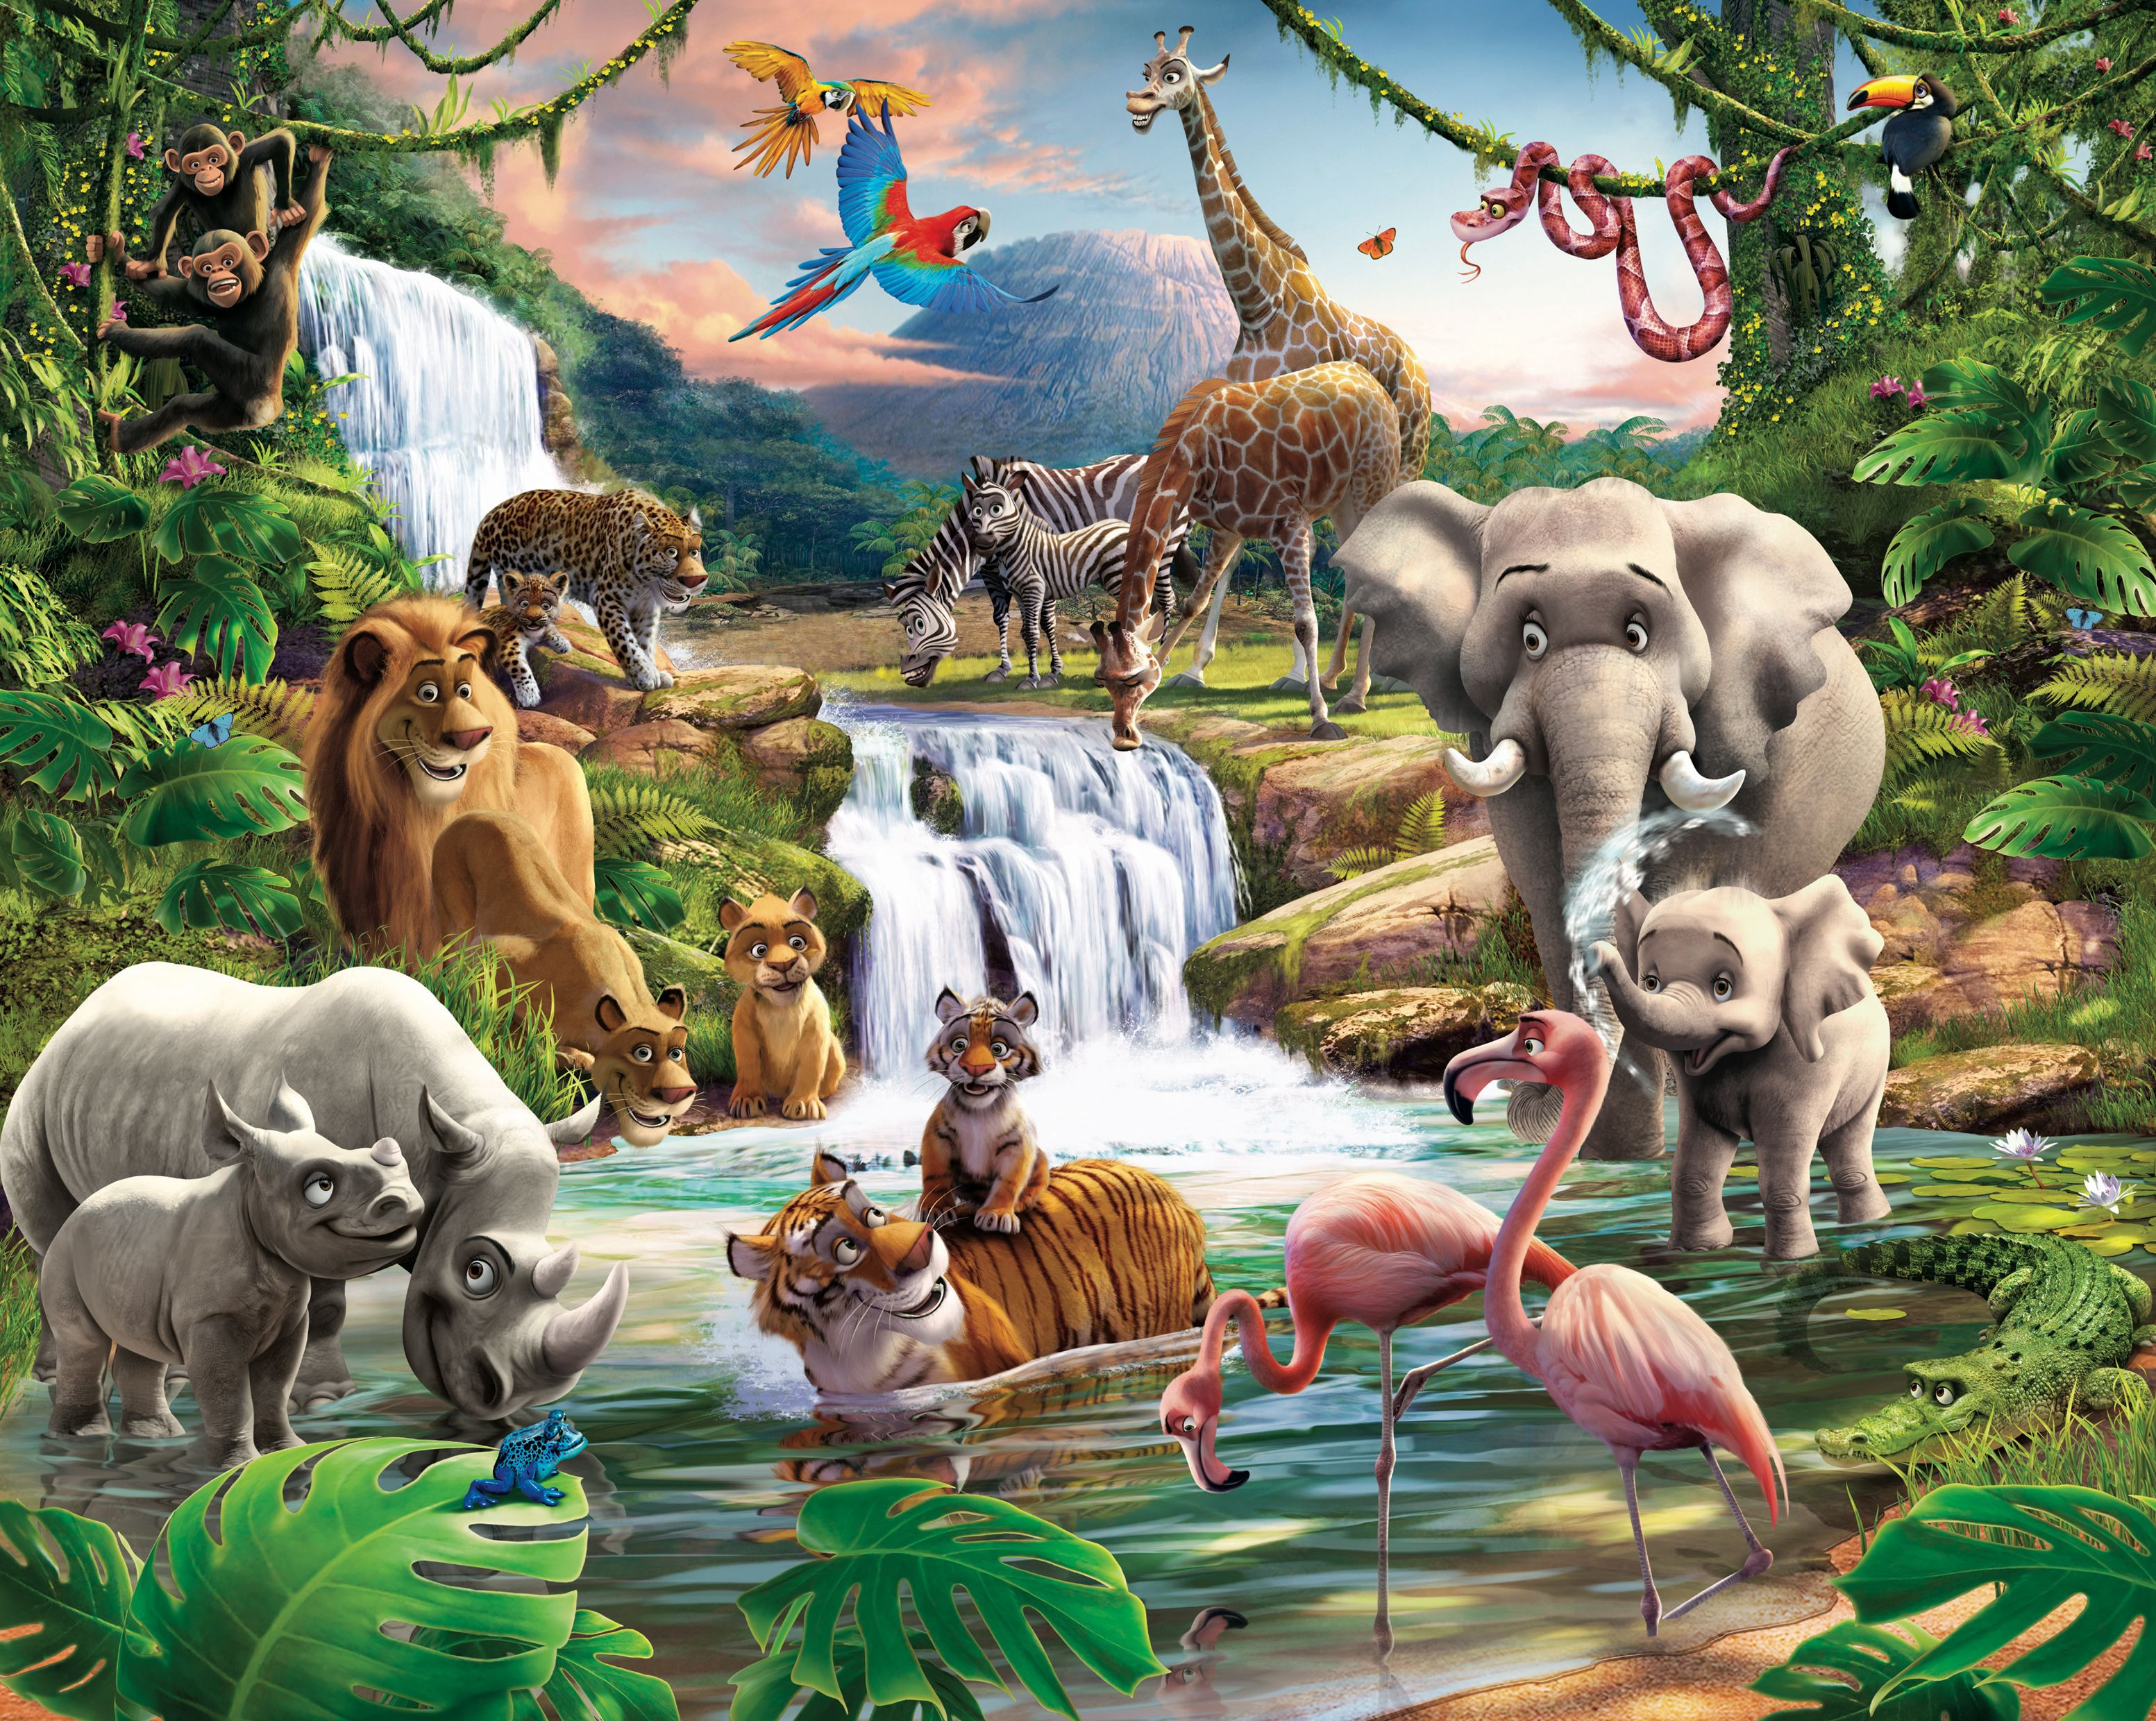 Jungle Adventure Wall Mural Departments Diy At B Amp Q